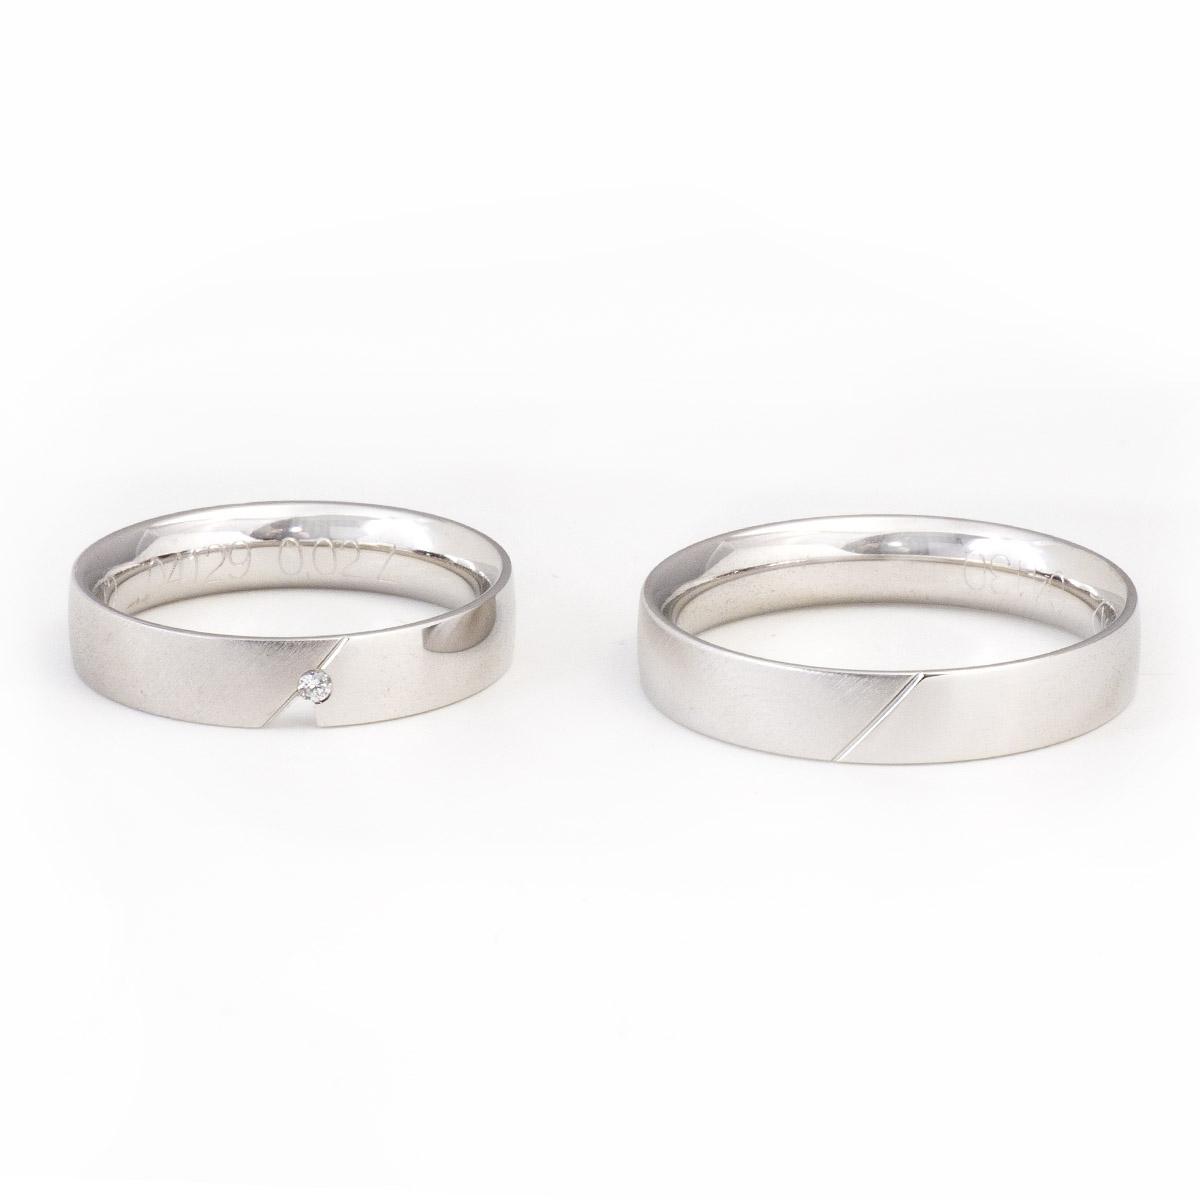 2 stk verlobung trauung ringe silber mit stein 64 56 partnerringe eheringe neu ebay. Black Bedroom Furniture Sets. Home Design Ideas